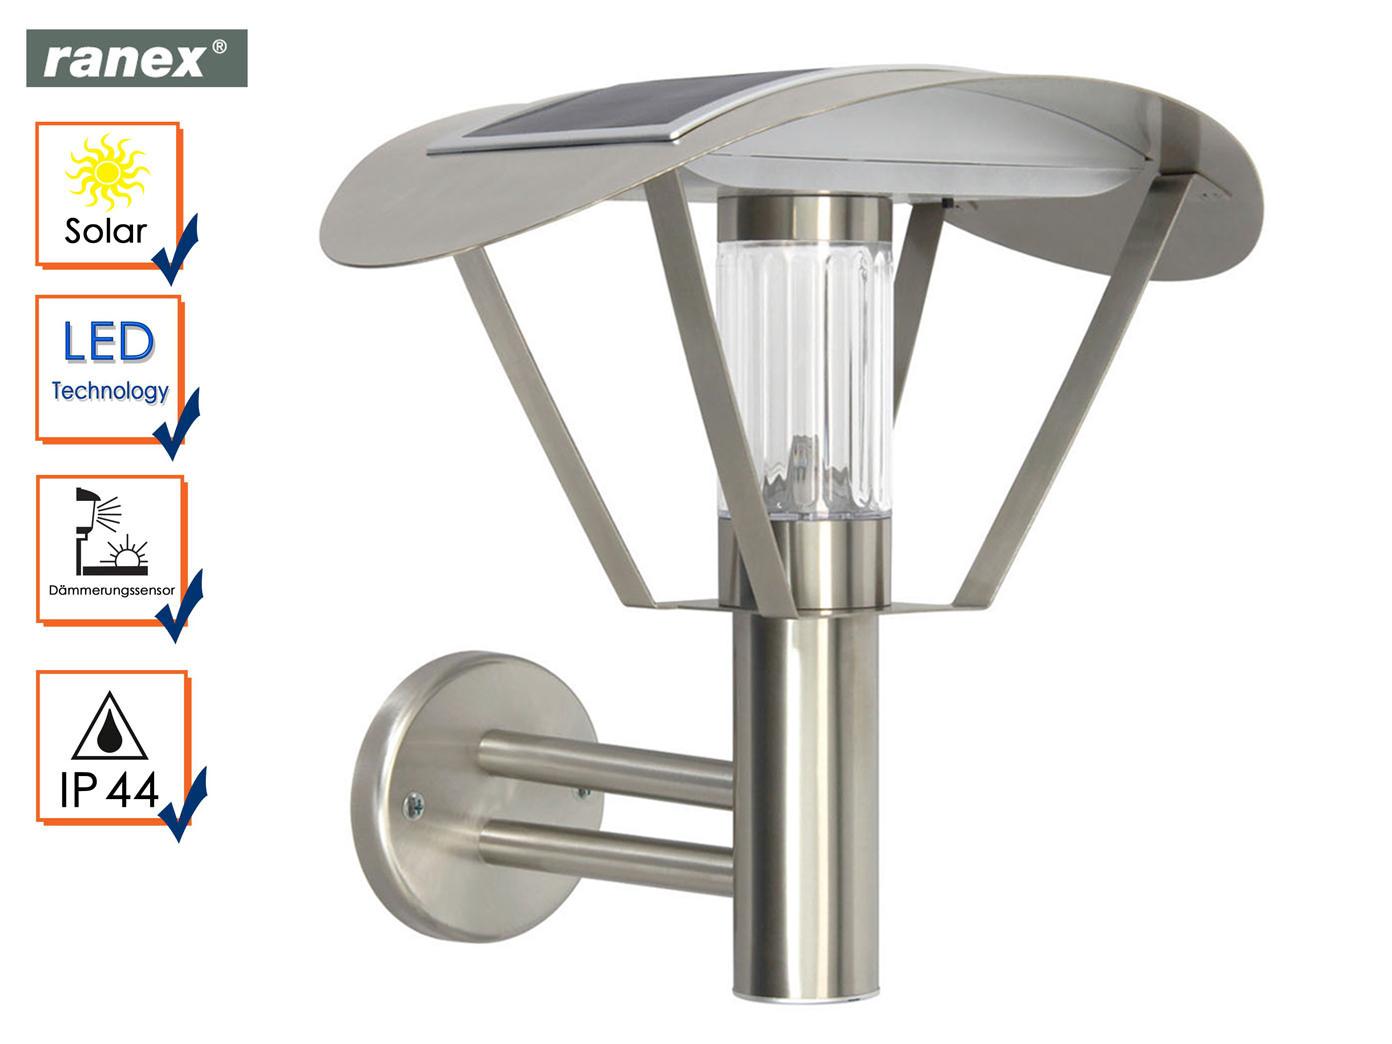 Solarlampe LED Außenwandleuchte Edelstahl, Dämmerungssensor, Solar Solar Solar Wandleuchte 34ca7a